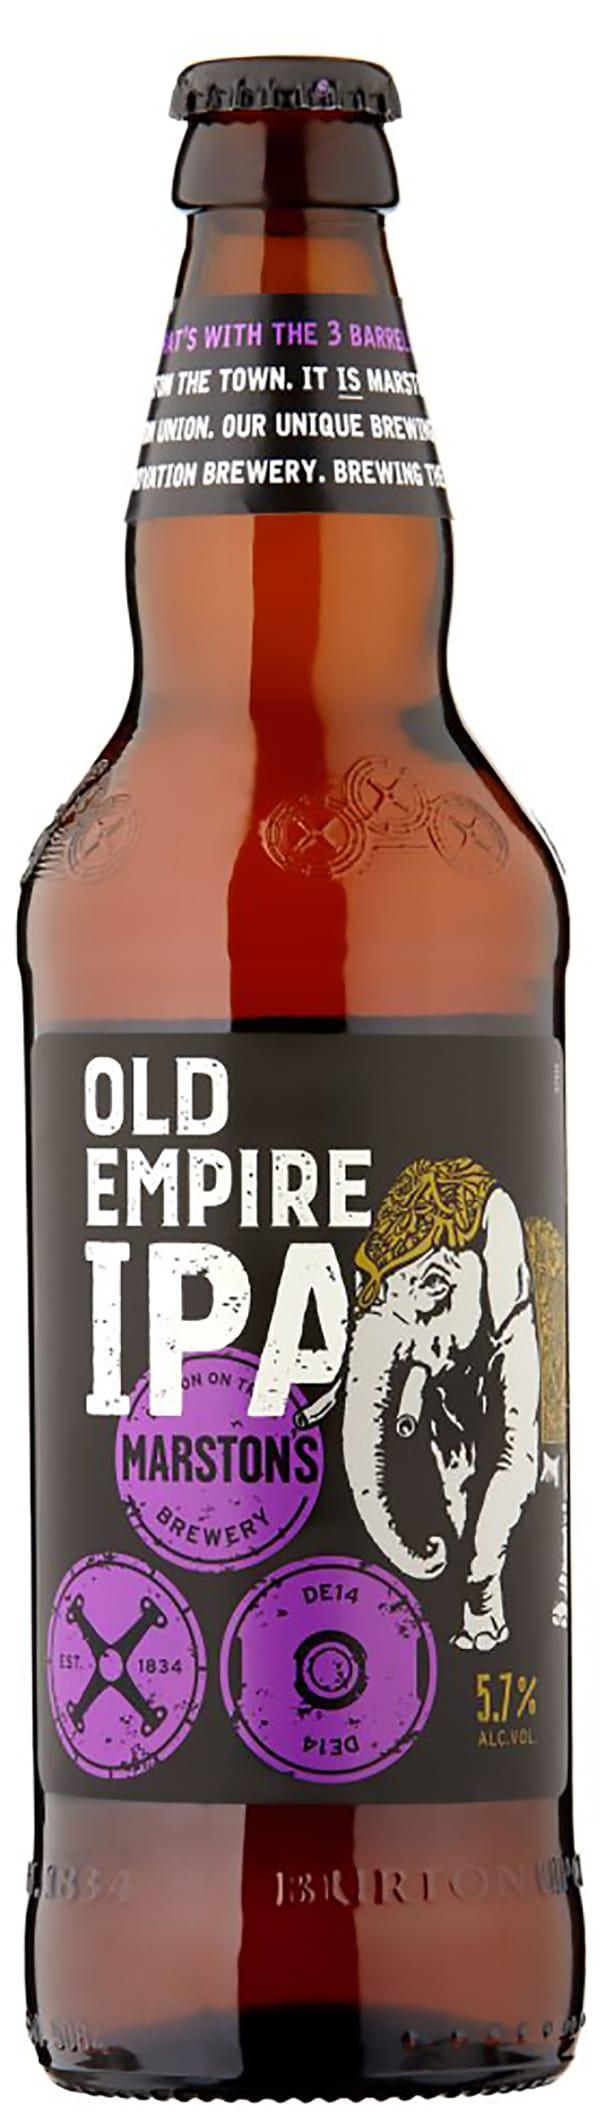 Marston's Old Empire India Pale Ale